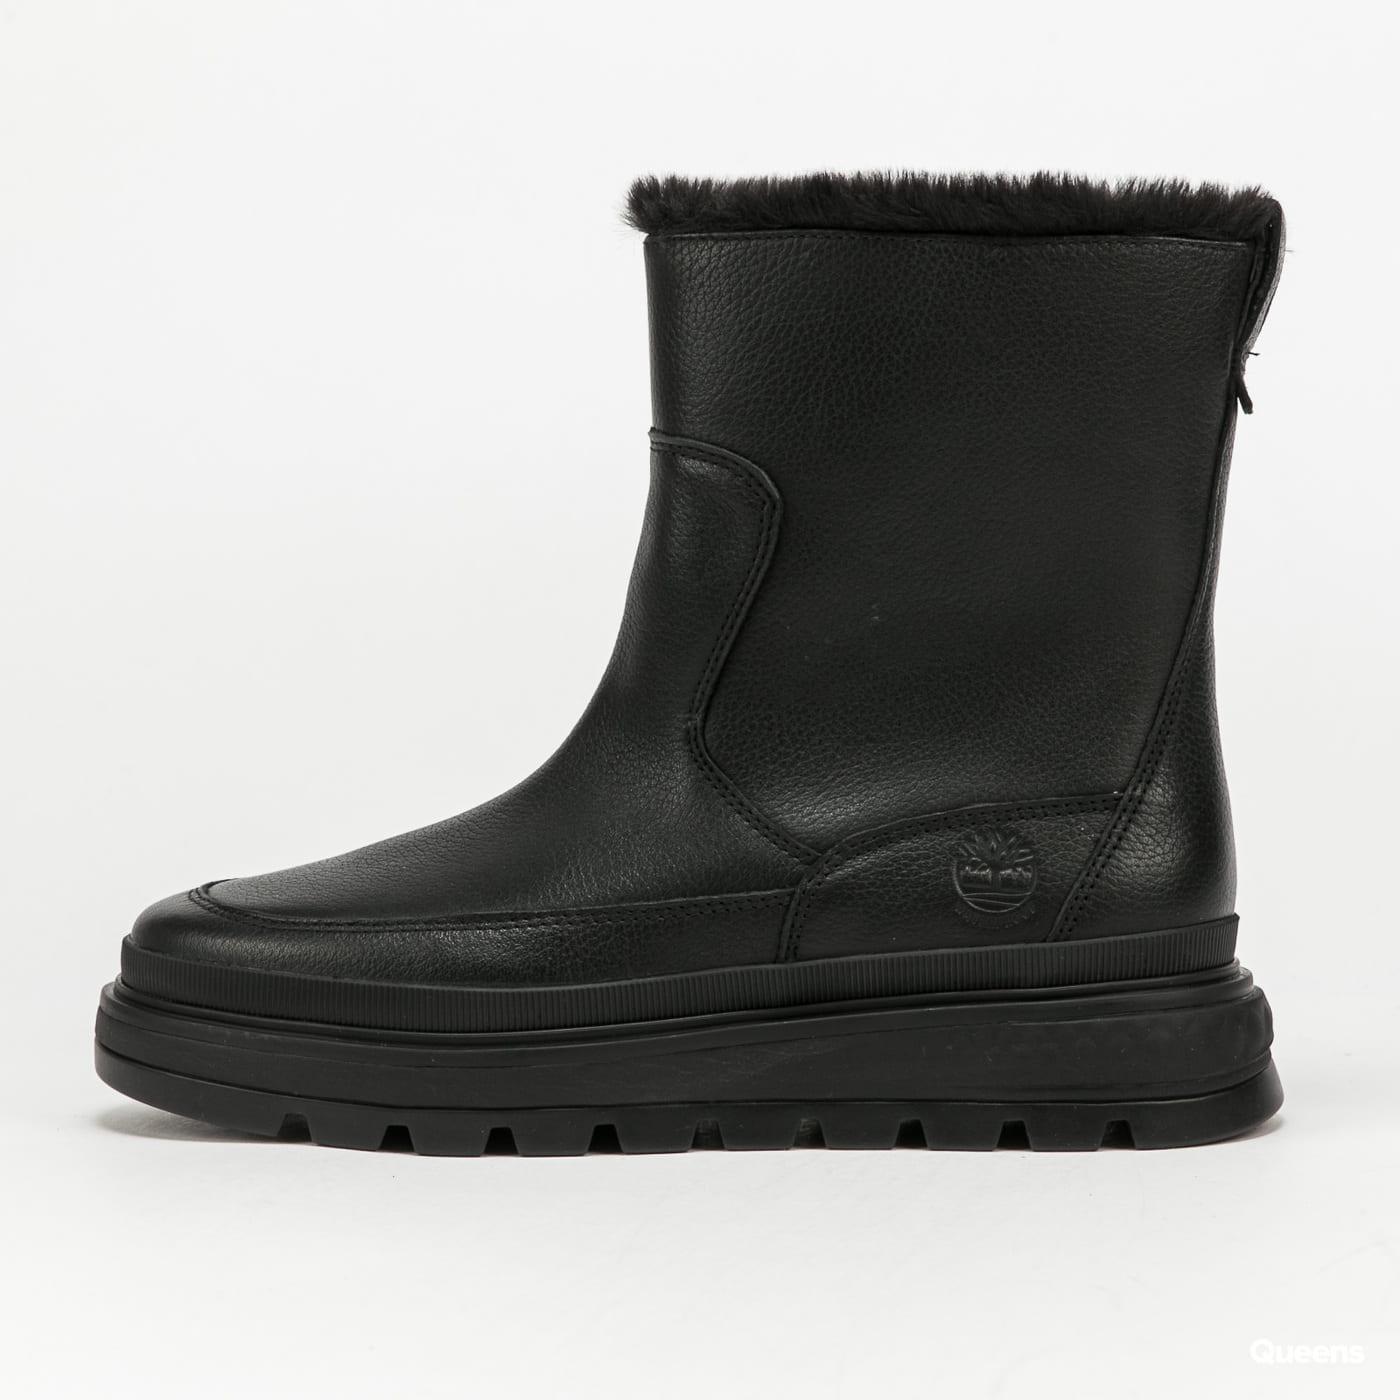 Timberland Ray City WP Warm Lined Boot black full grain